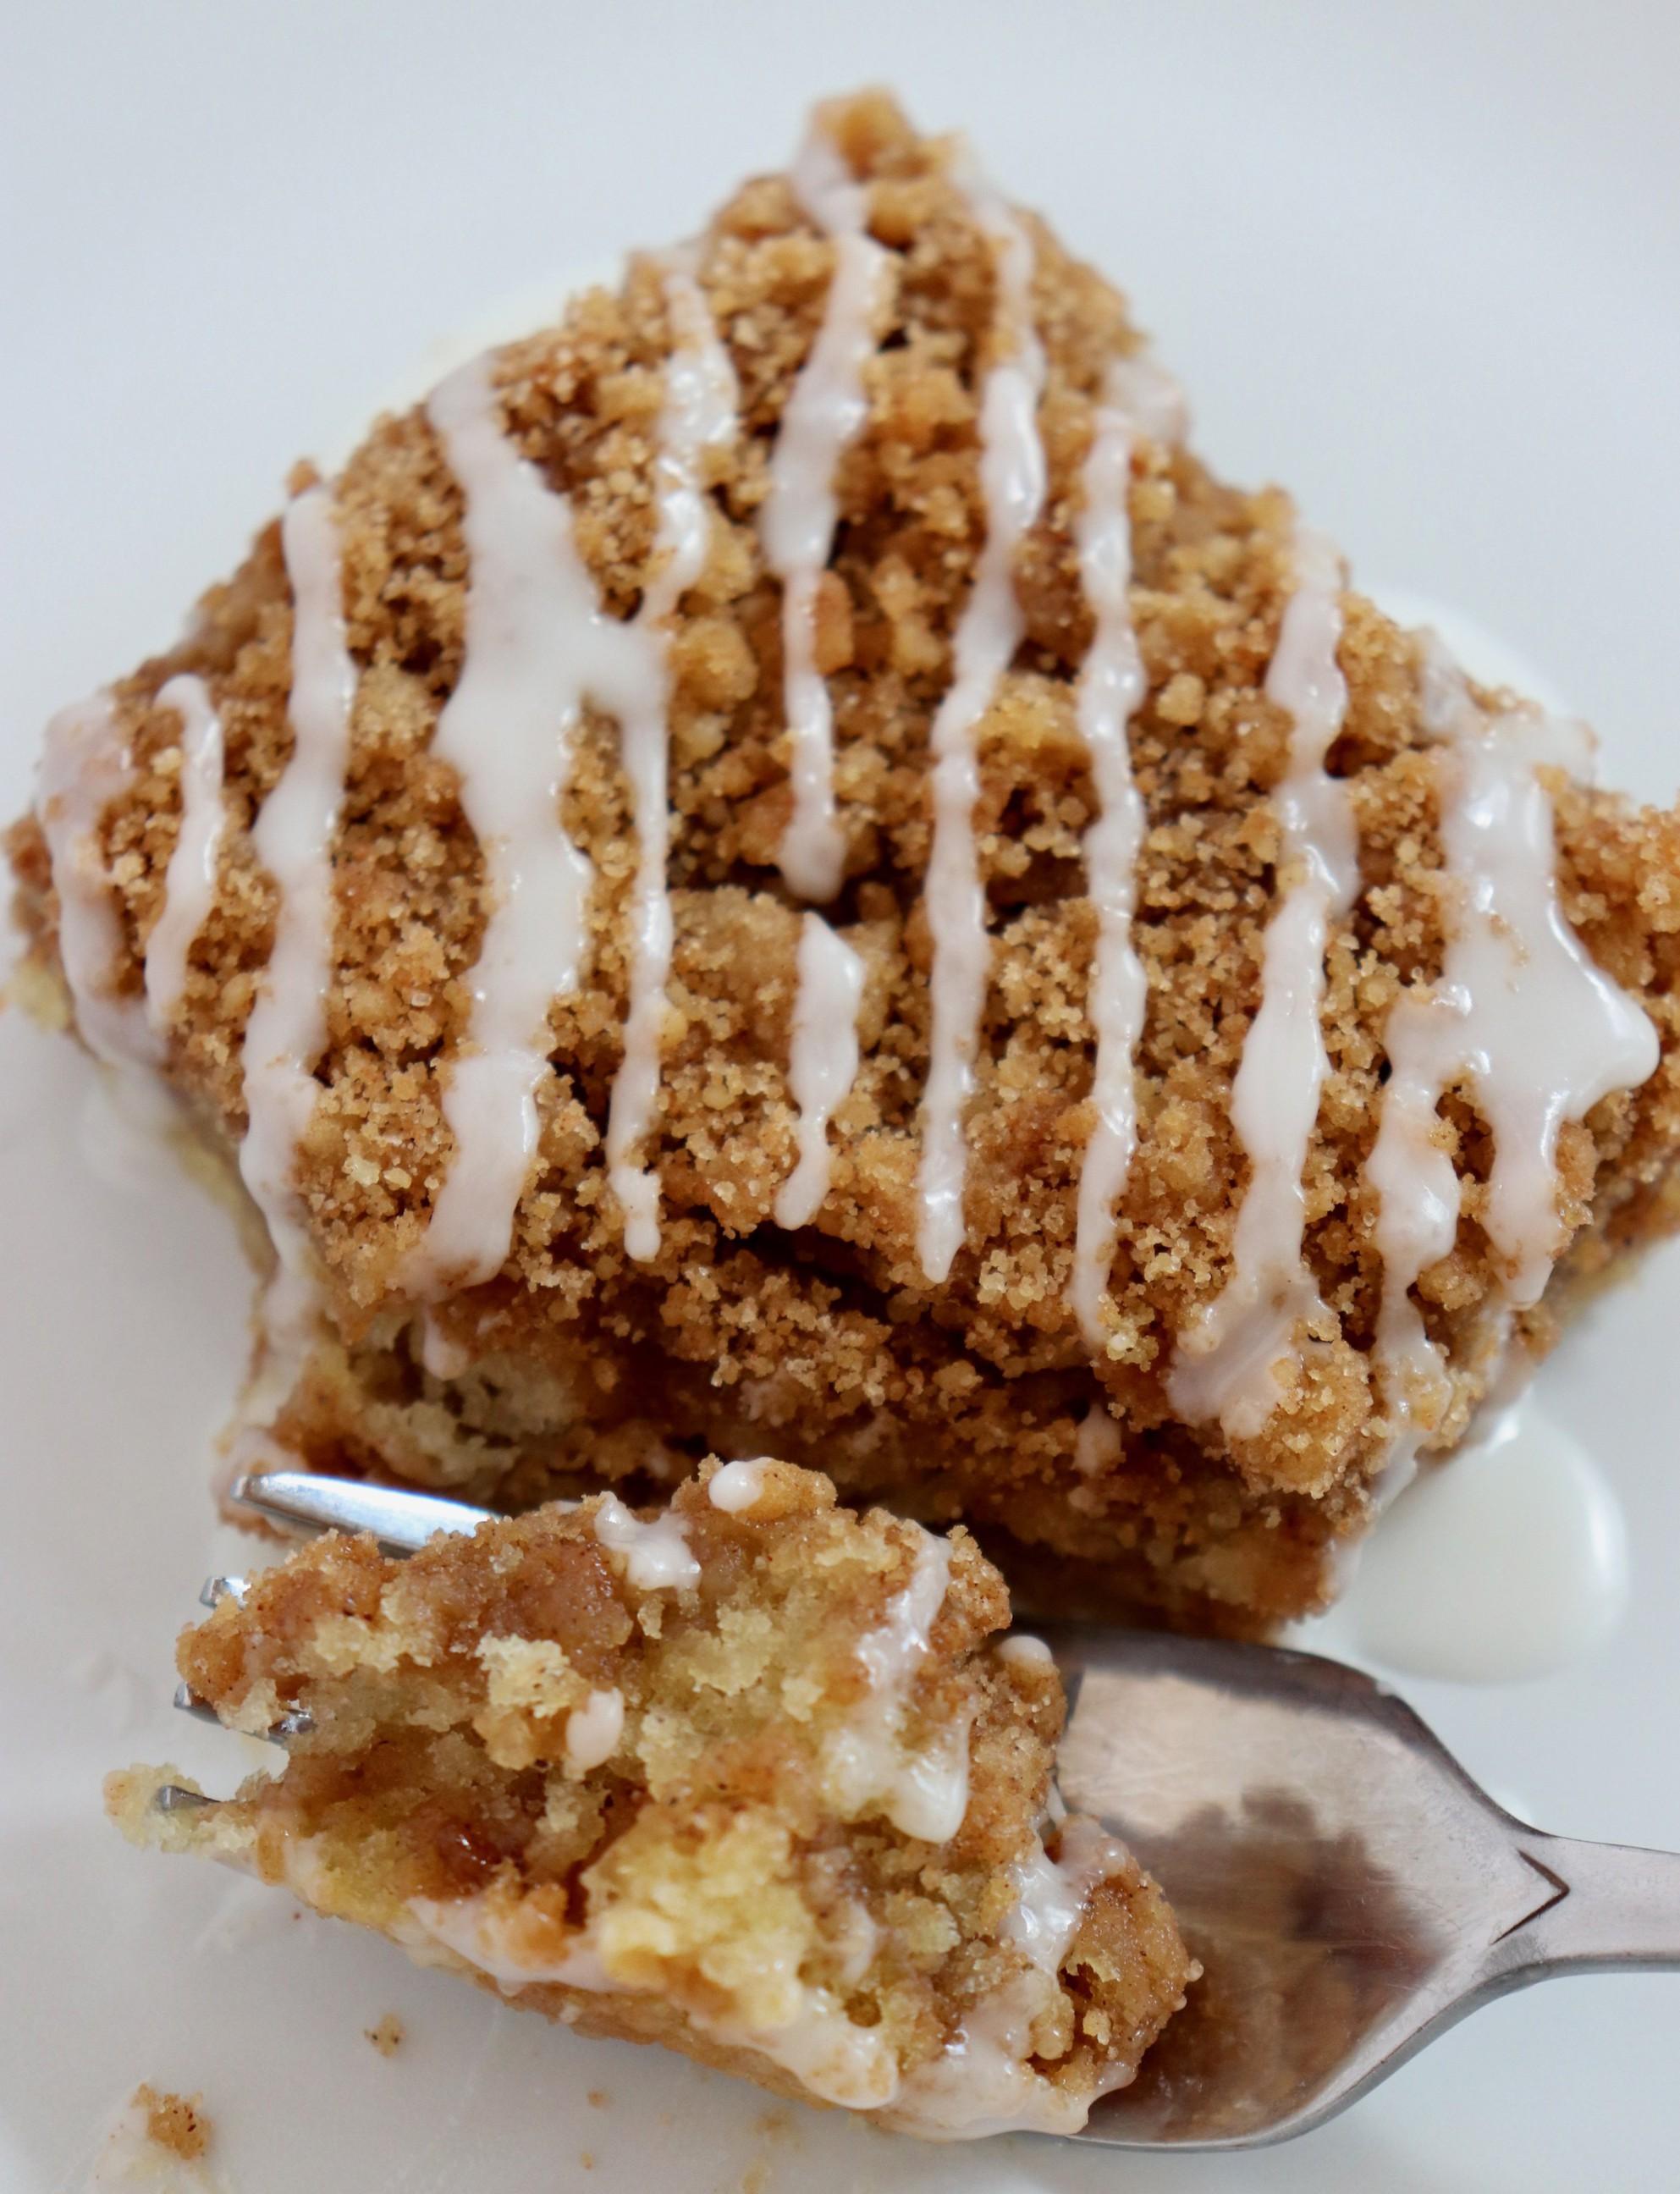 Cinnamon Streusel Coffee Cake Alicia Jacobs Copy Me That